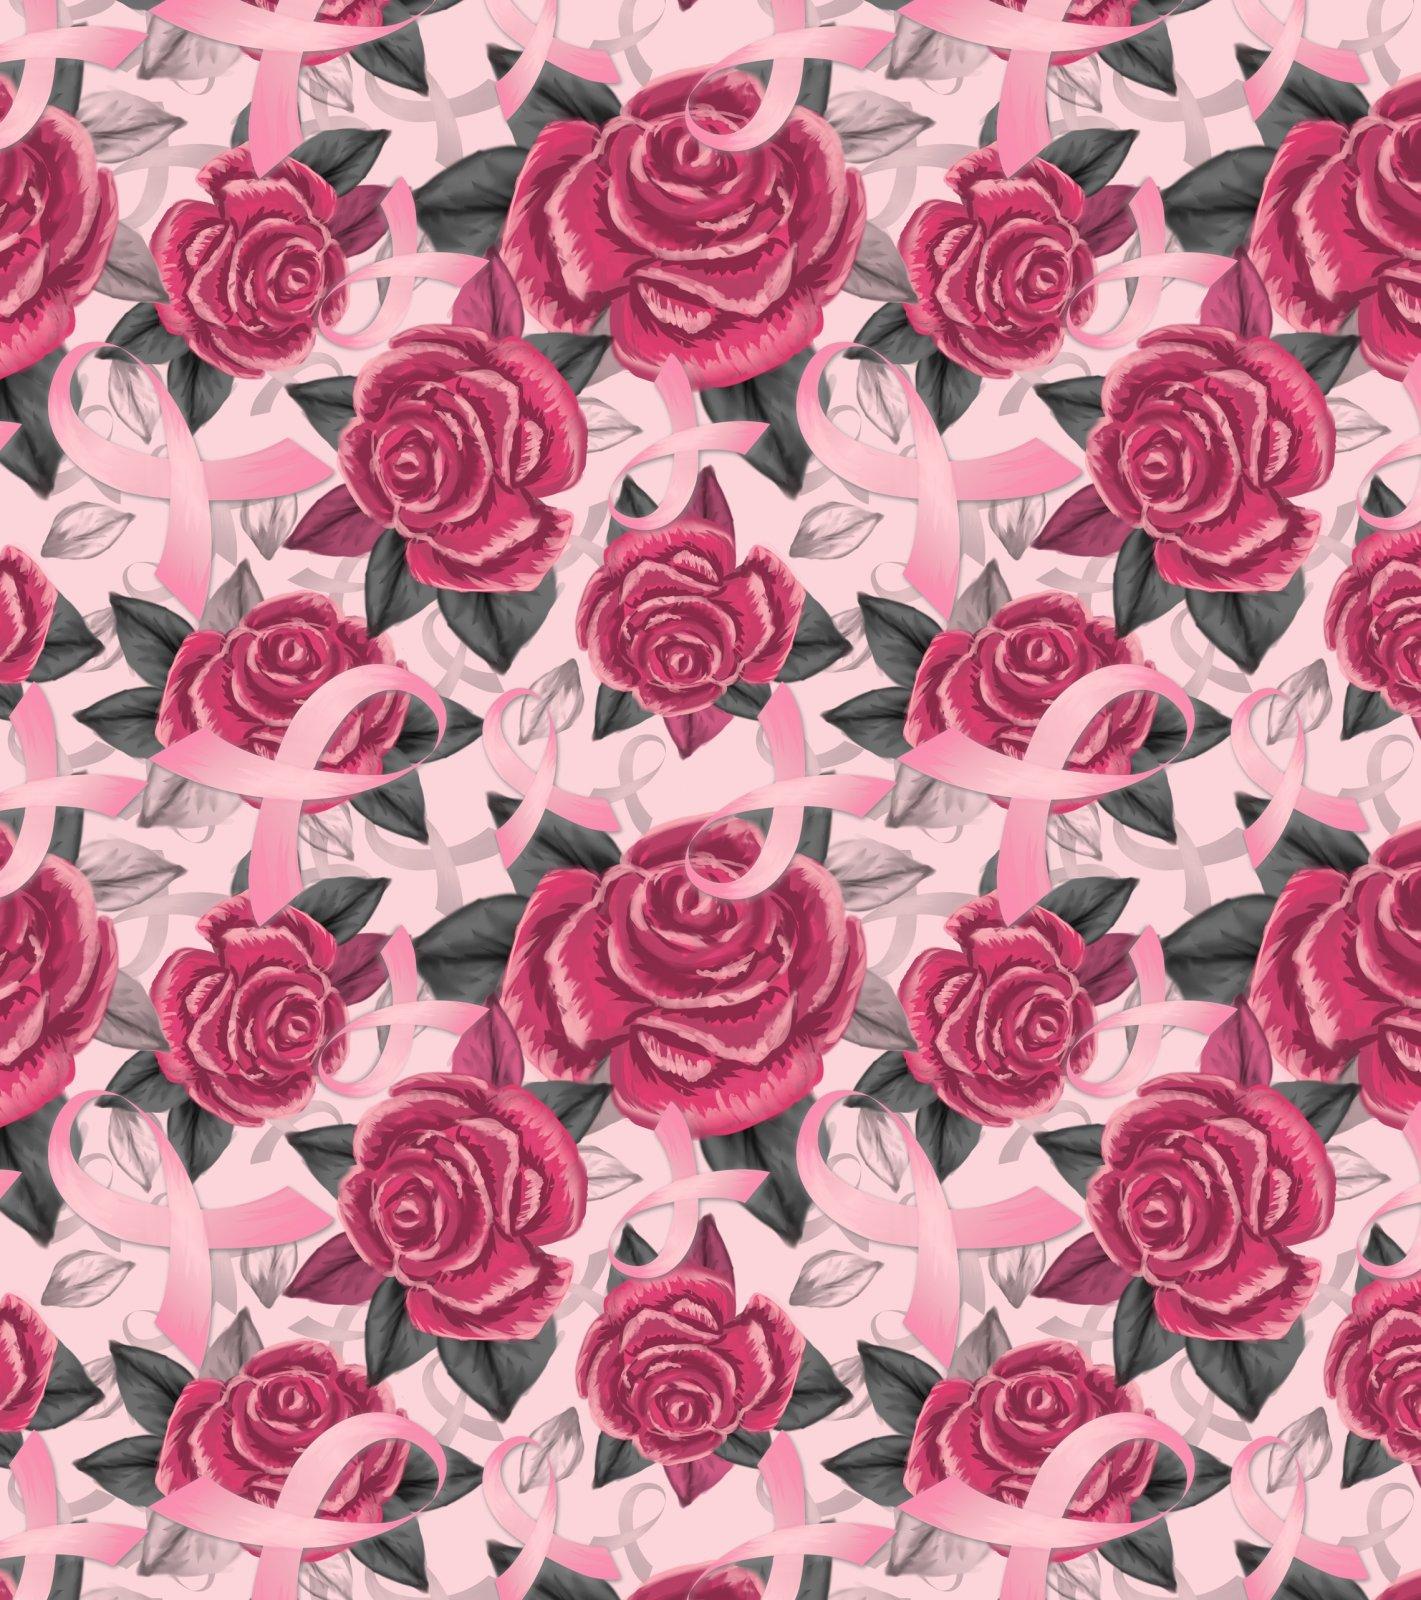 DT-Exclusive Digital Prints DT-3055-0C-2 Pink - Ribbon & Roses